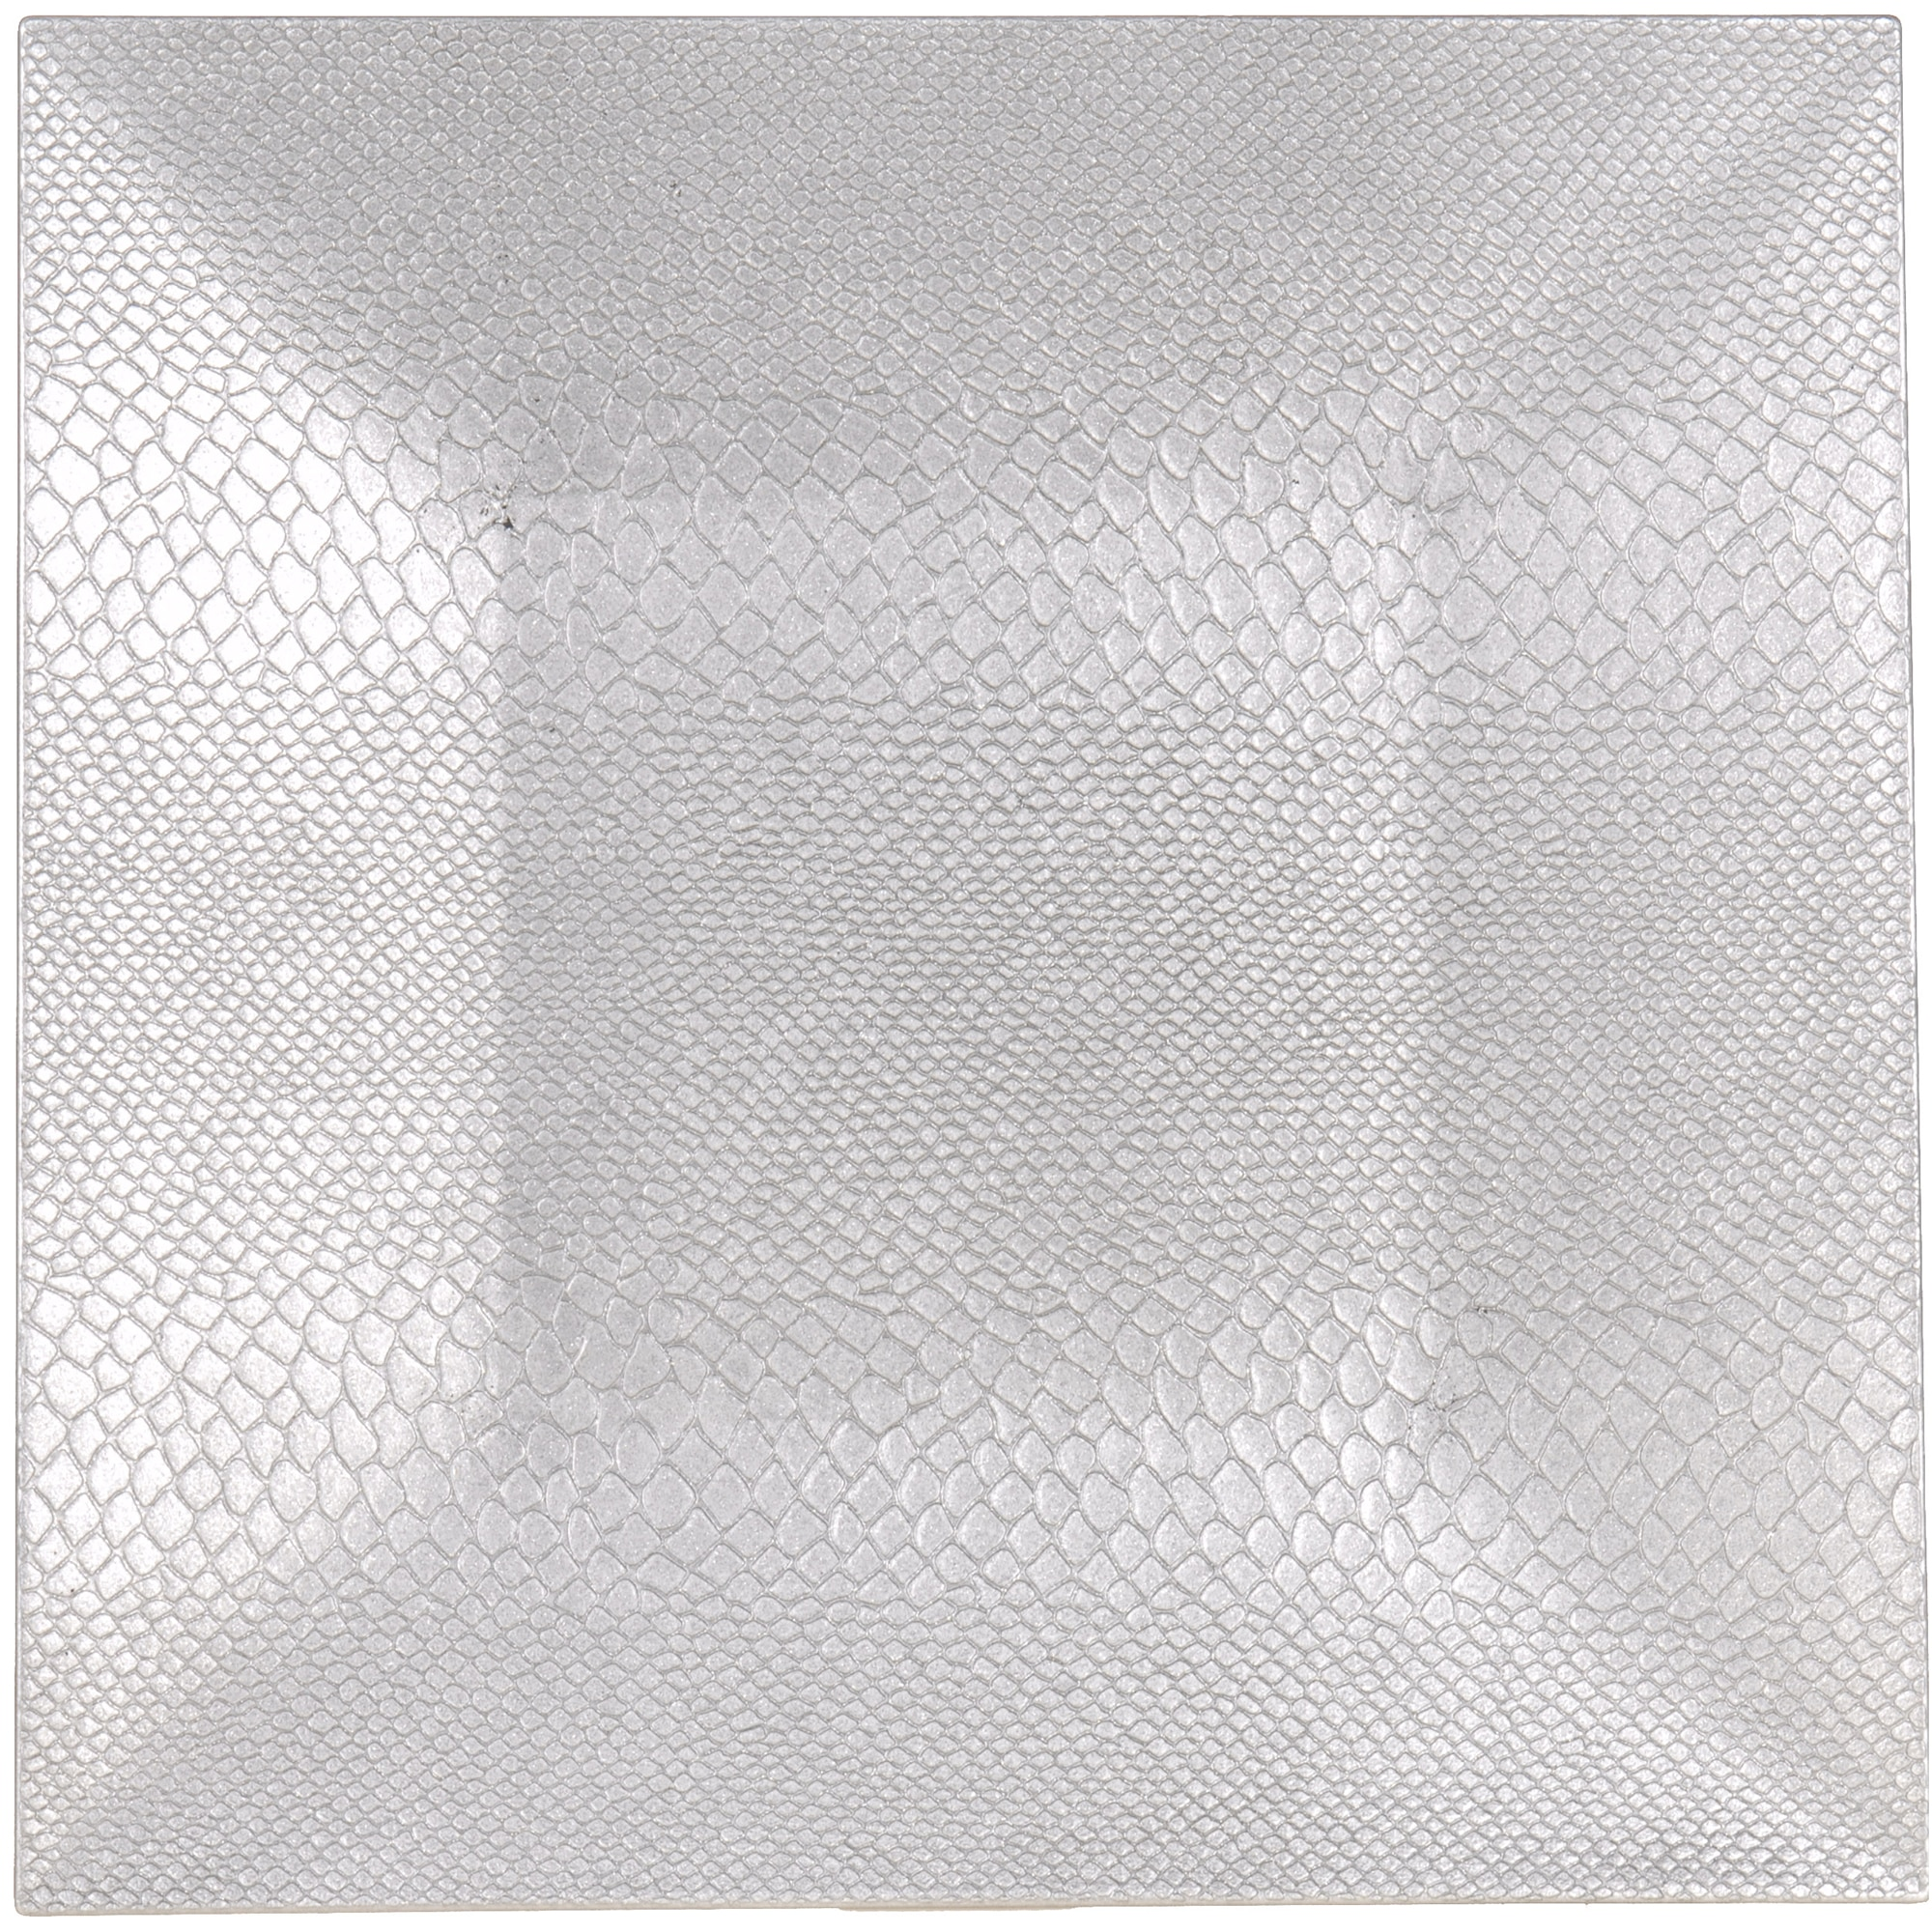 Fotografie Farfurie plastic Excellence Houseware, 25 cm, Patrata, Argintiu